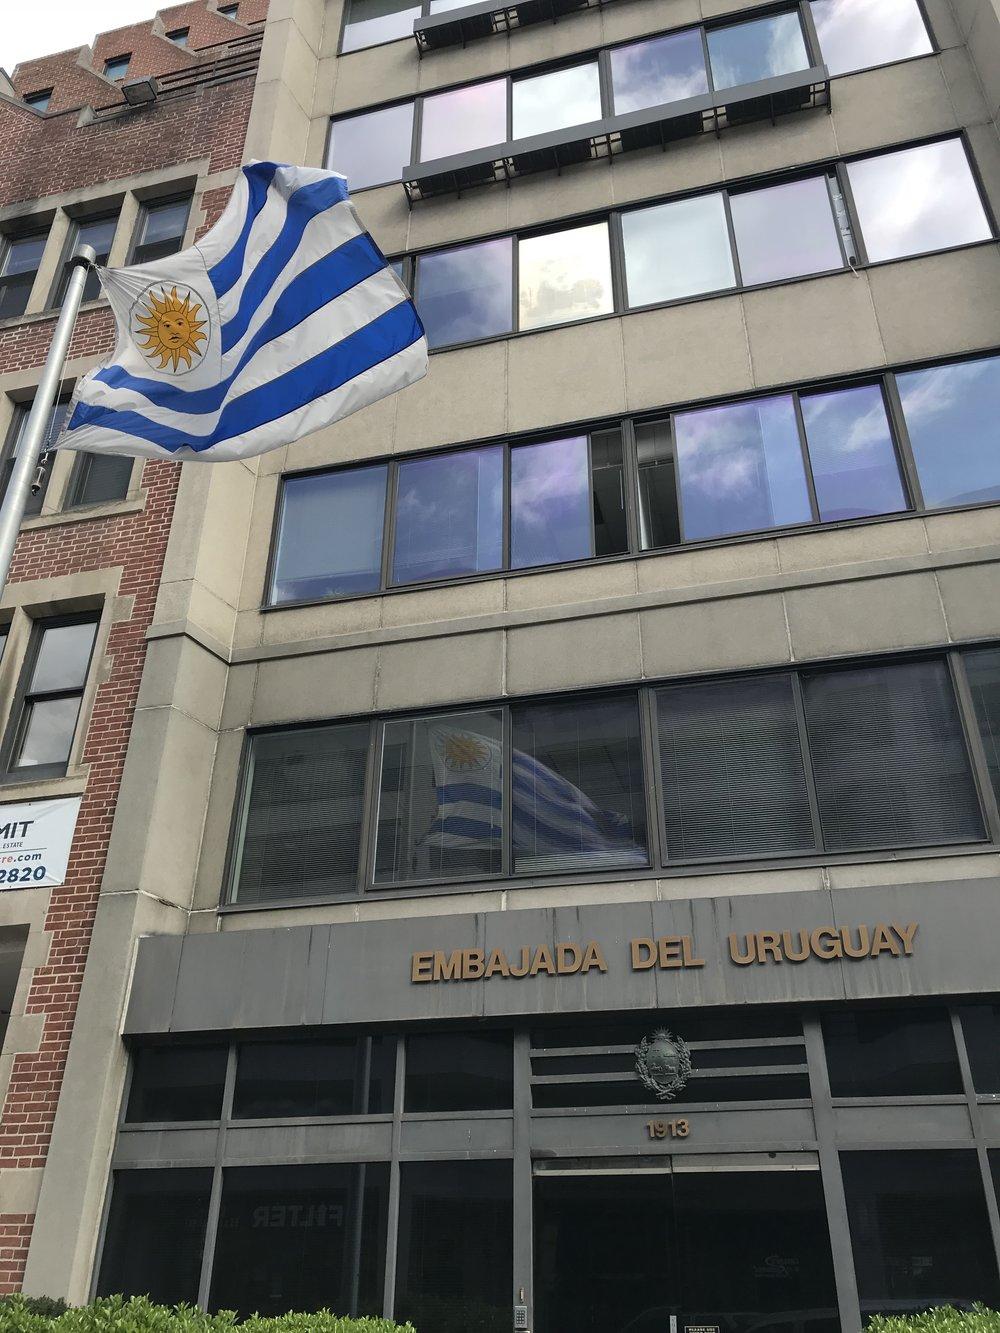 The Embassy of Uruguay.